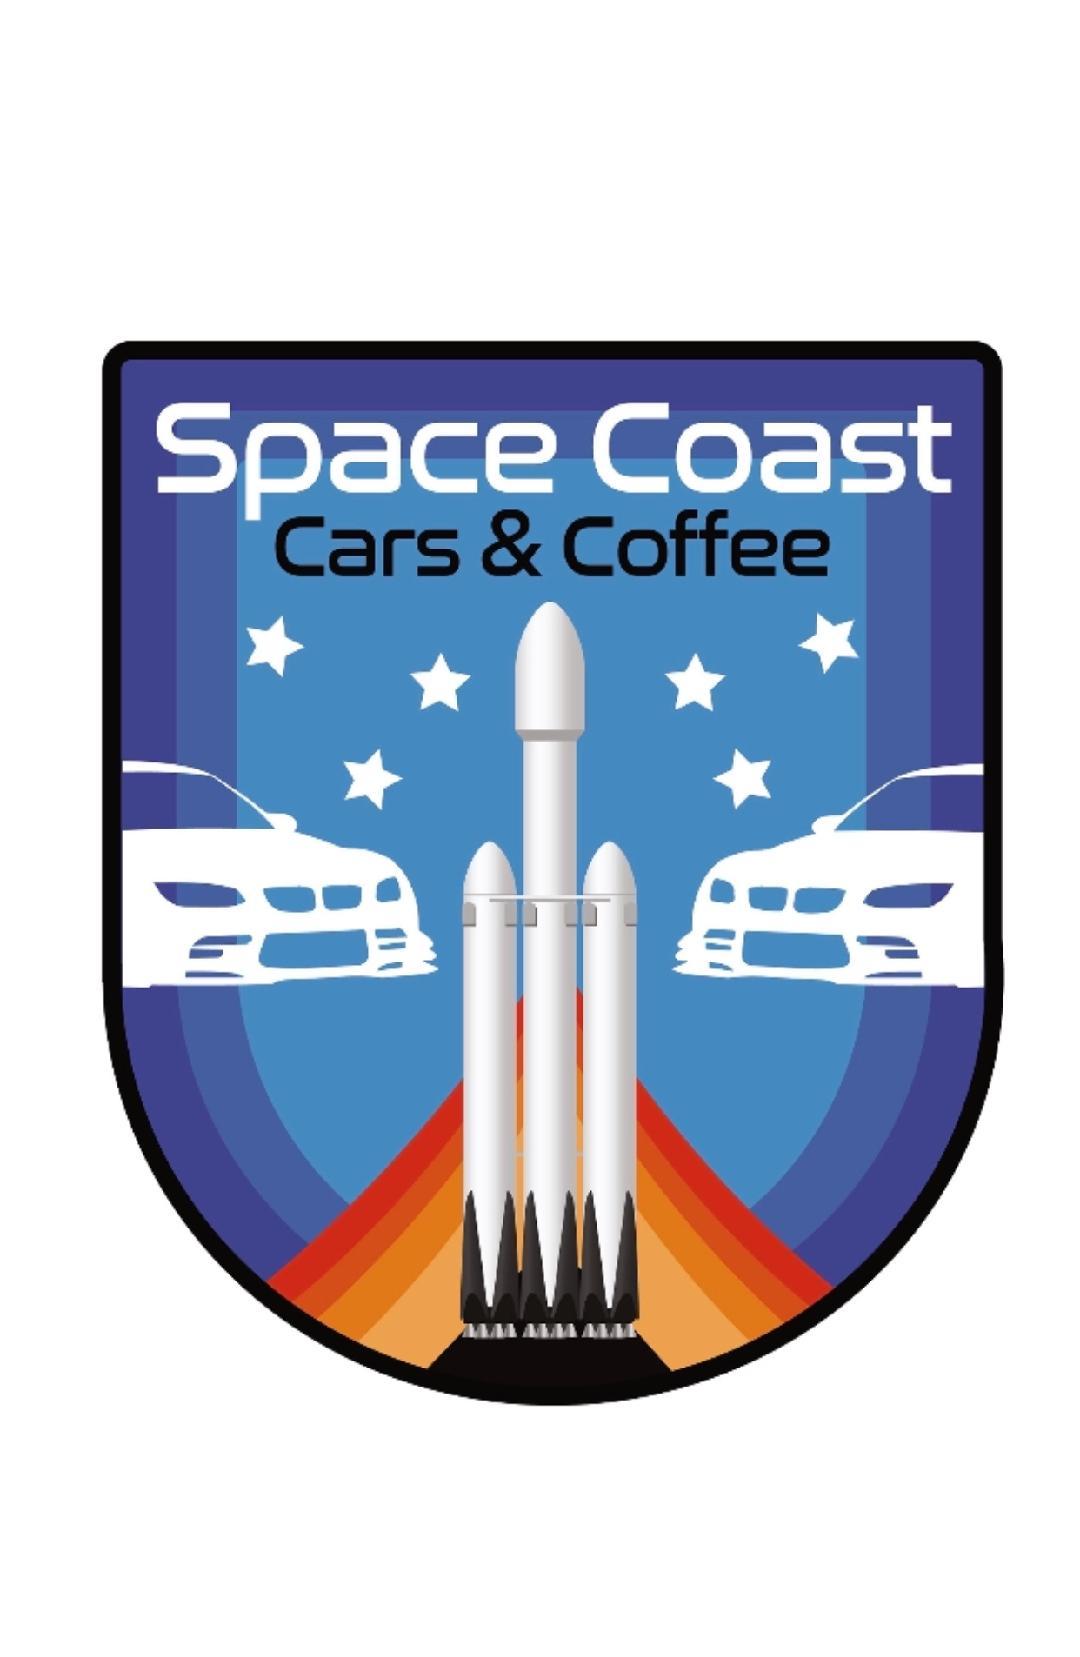 Space Coast Cars and Coffee